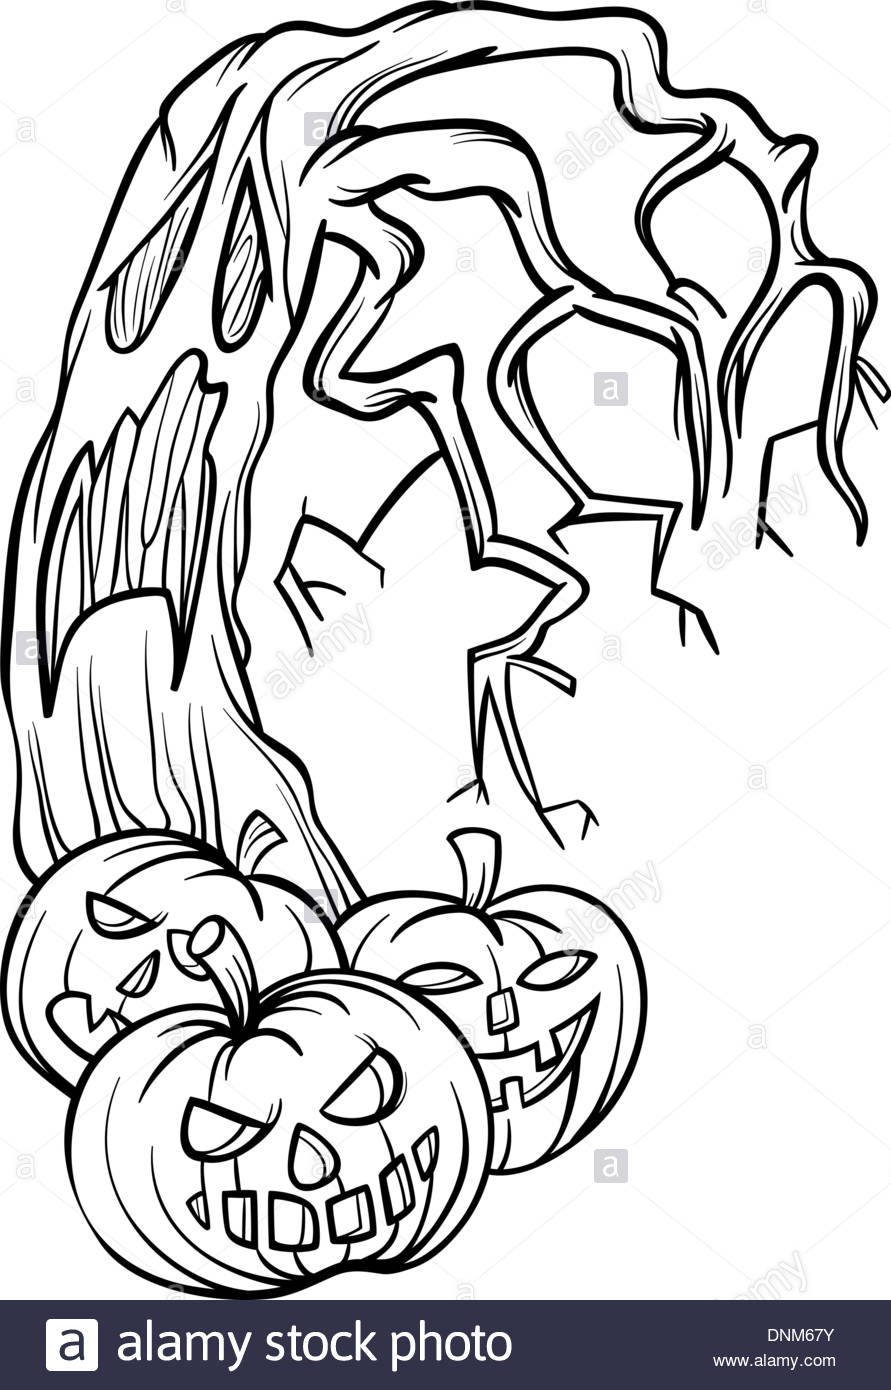 891x1390 Black And White Cartoon Illustration Of Halloween Pumpkins